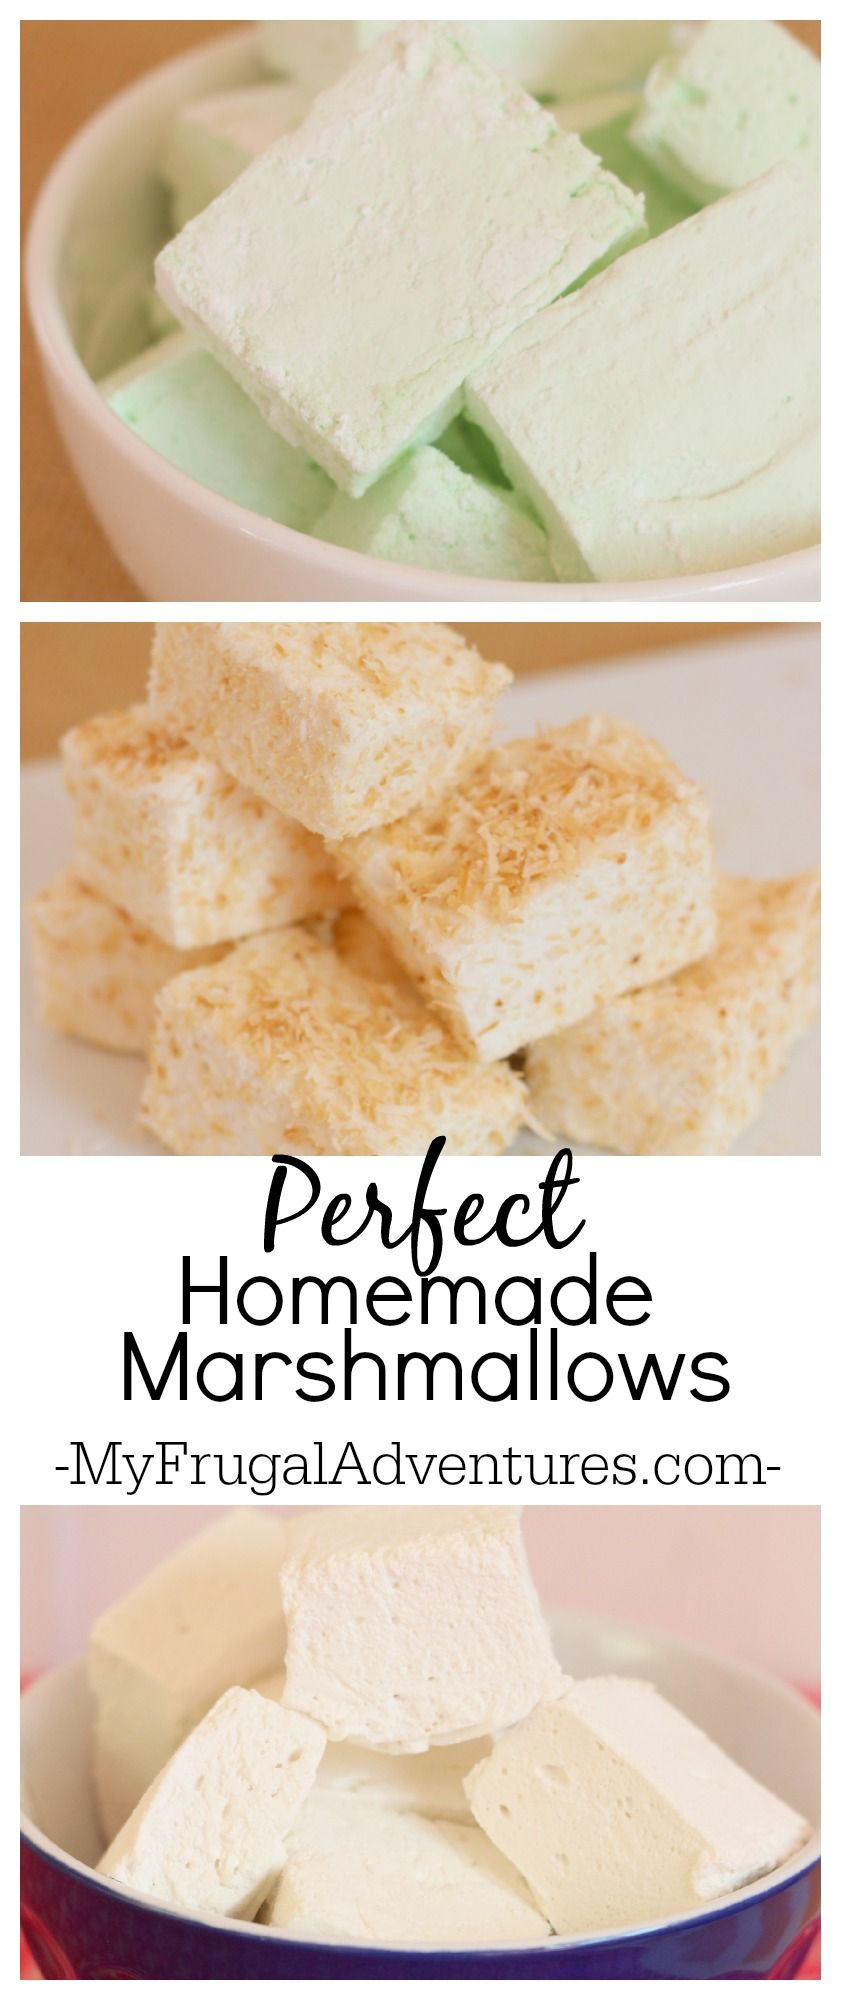 How to Make Homemade Marshmallows #marshmallow